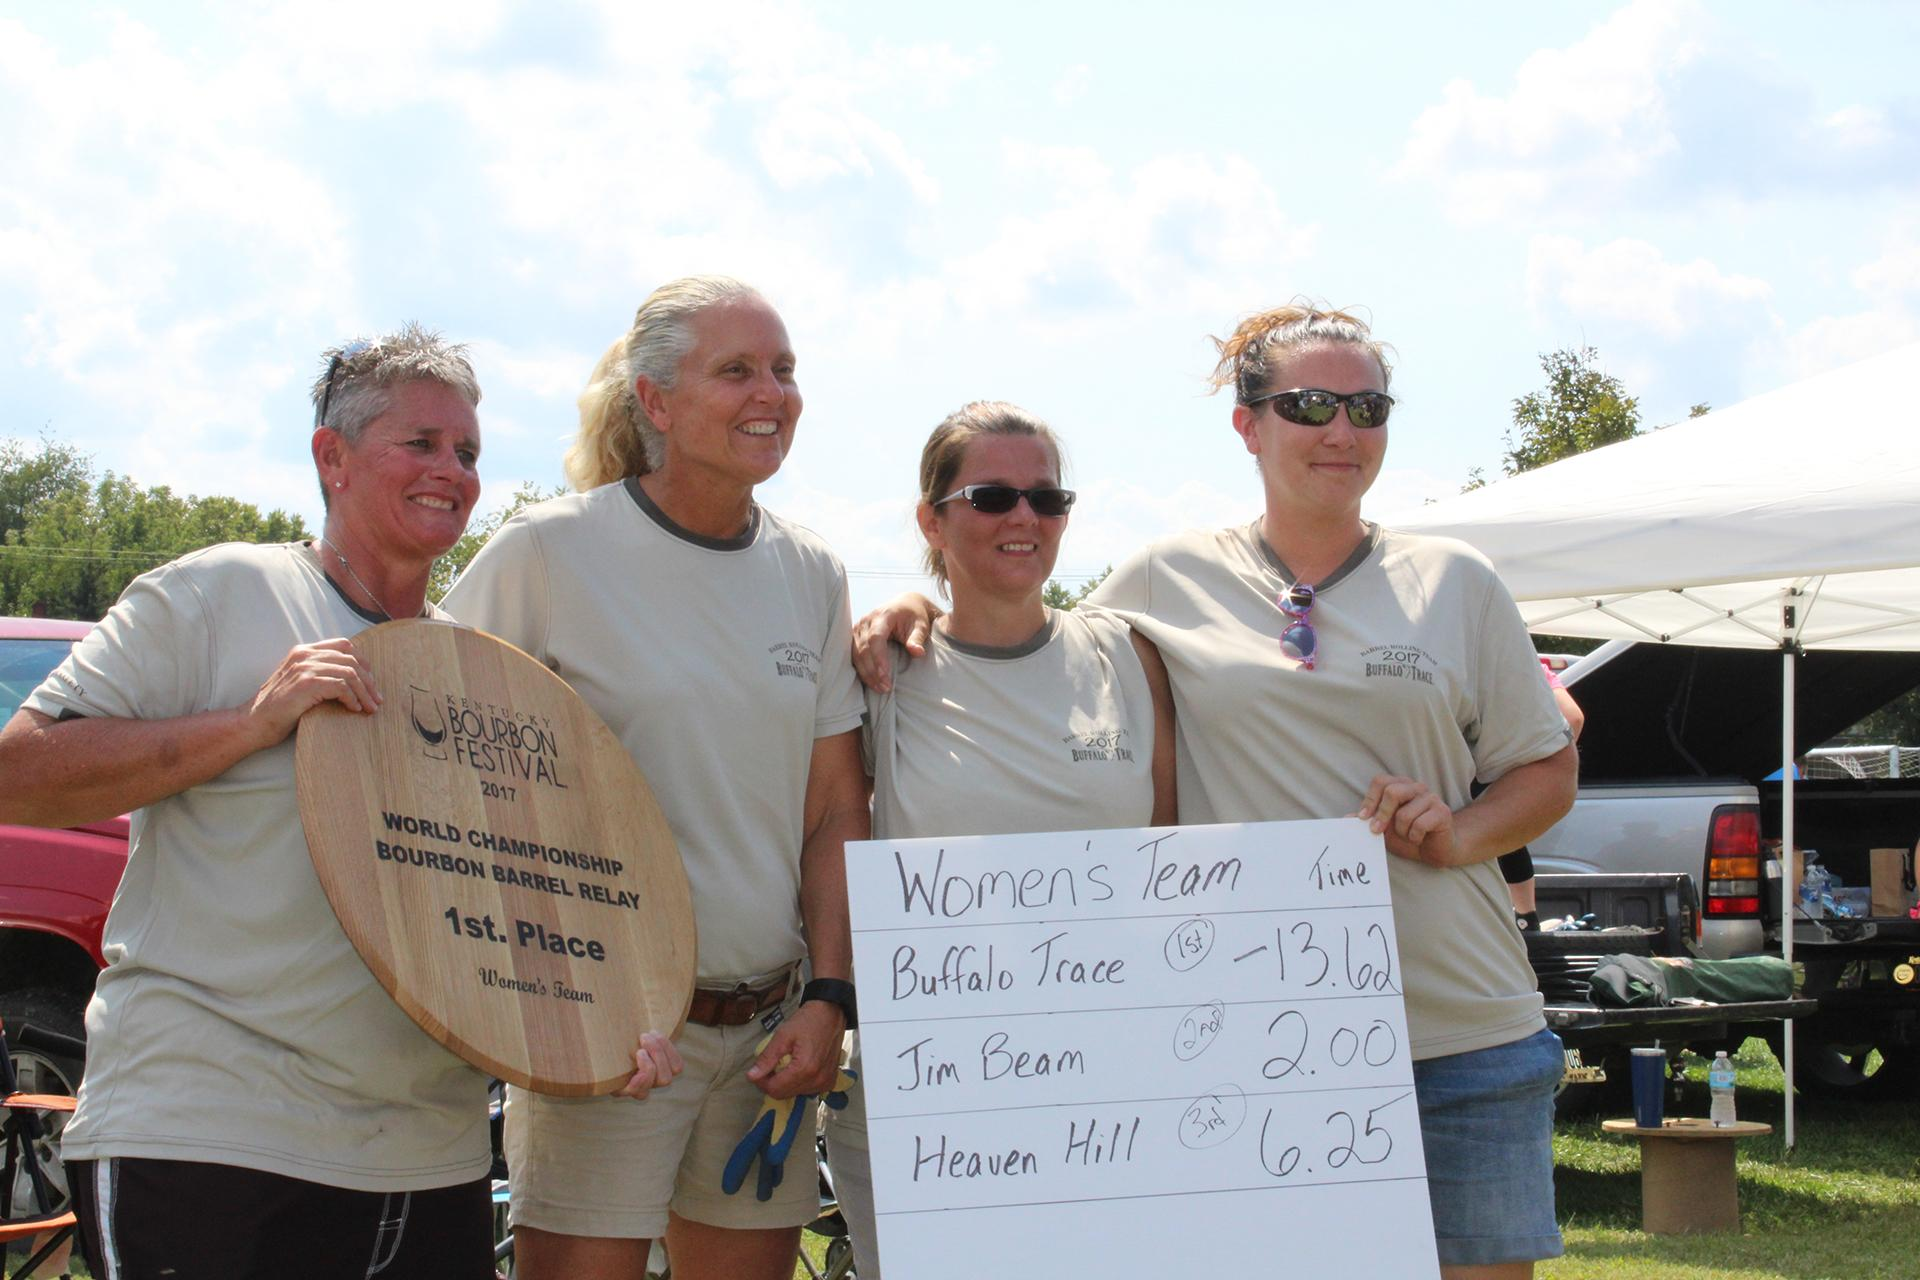 Buffalo Trace Women's Barrel Relay Team